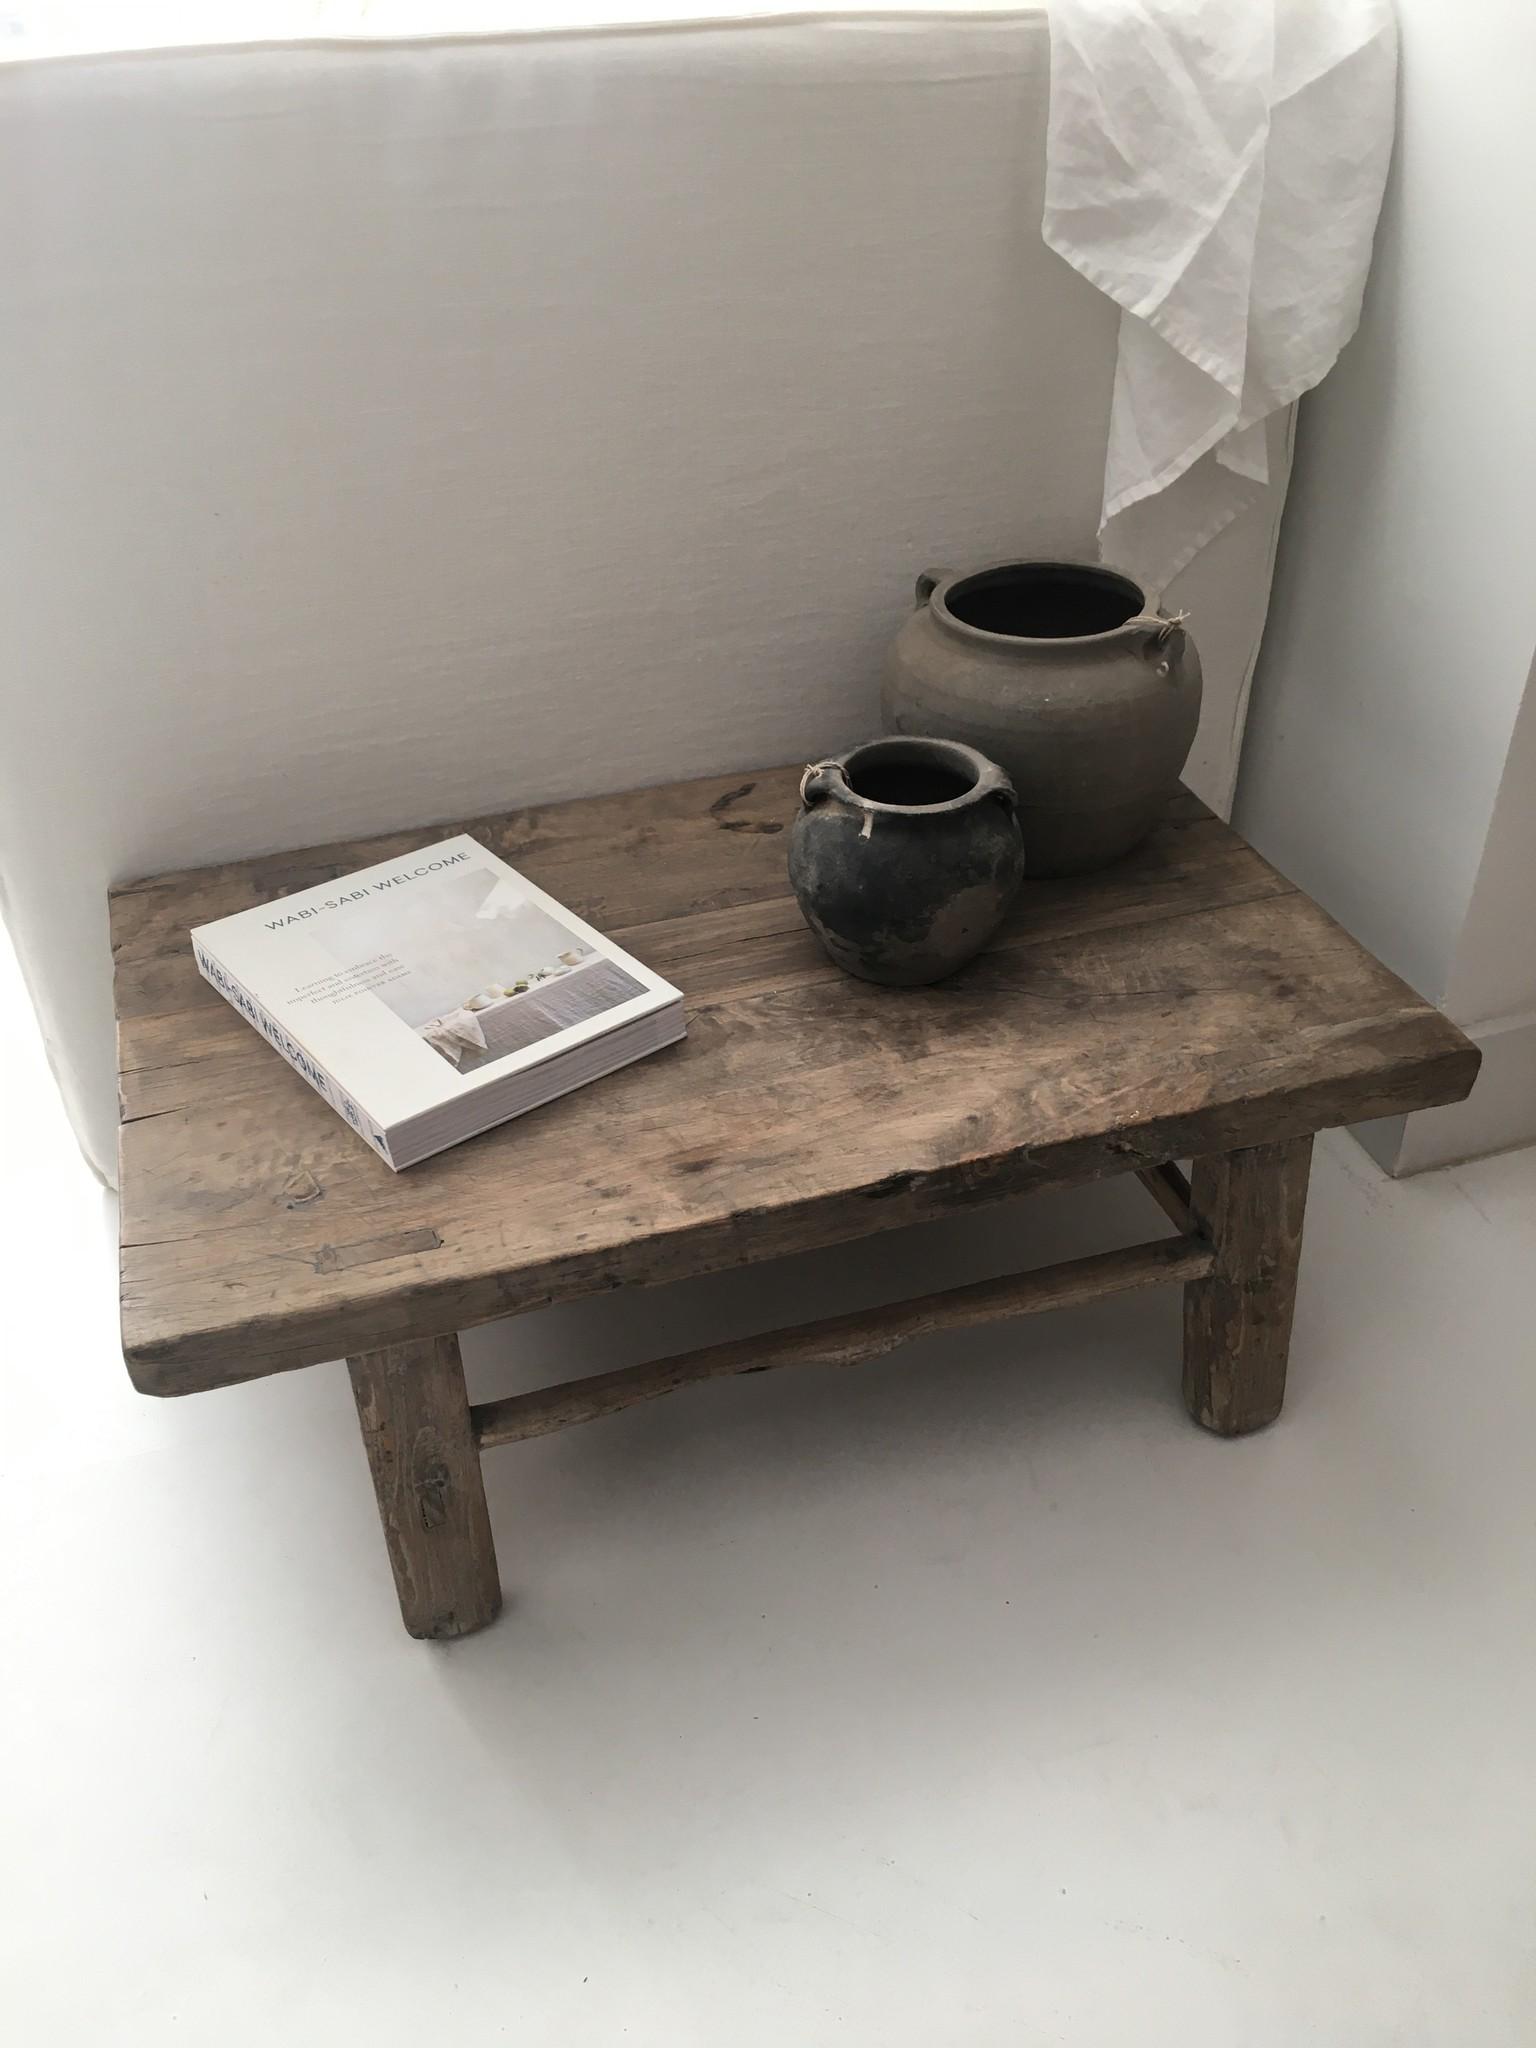 Snowdrops Copenhagen Coffee table vintage Raw Wood - 74x46x28cm - unique piece